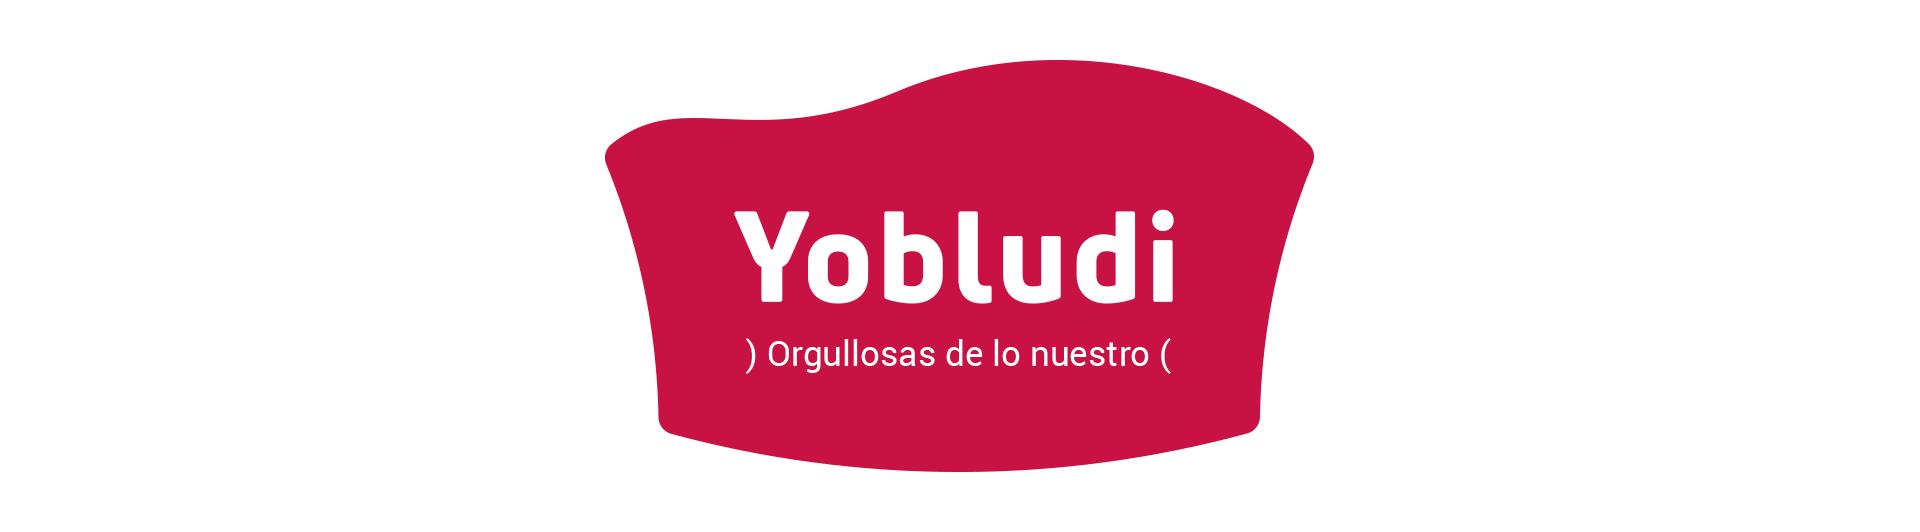 Logotipo diseñado para Yobludi